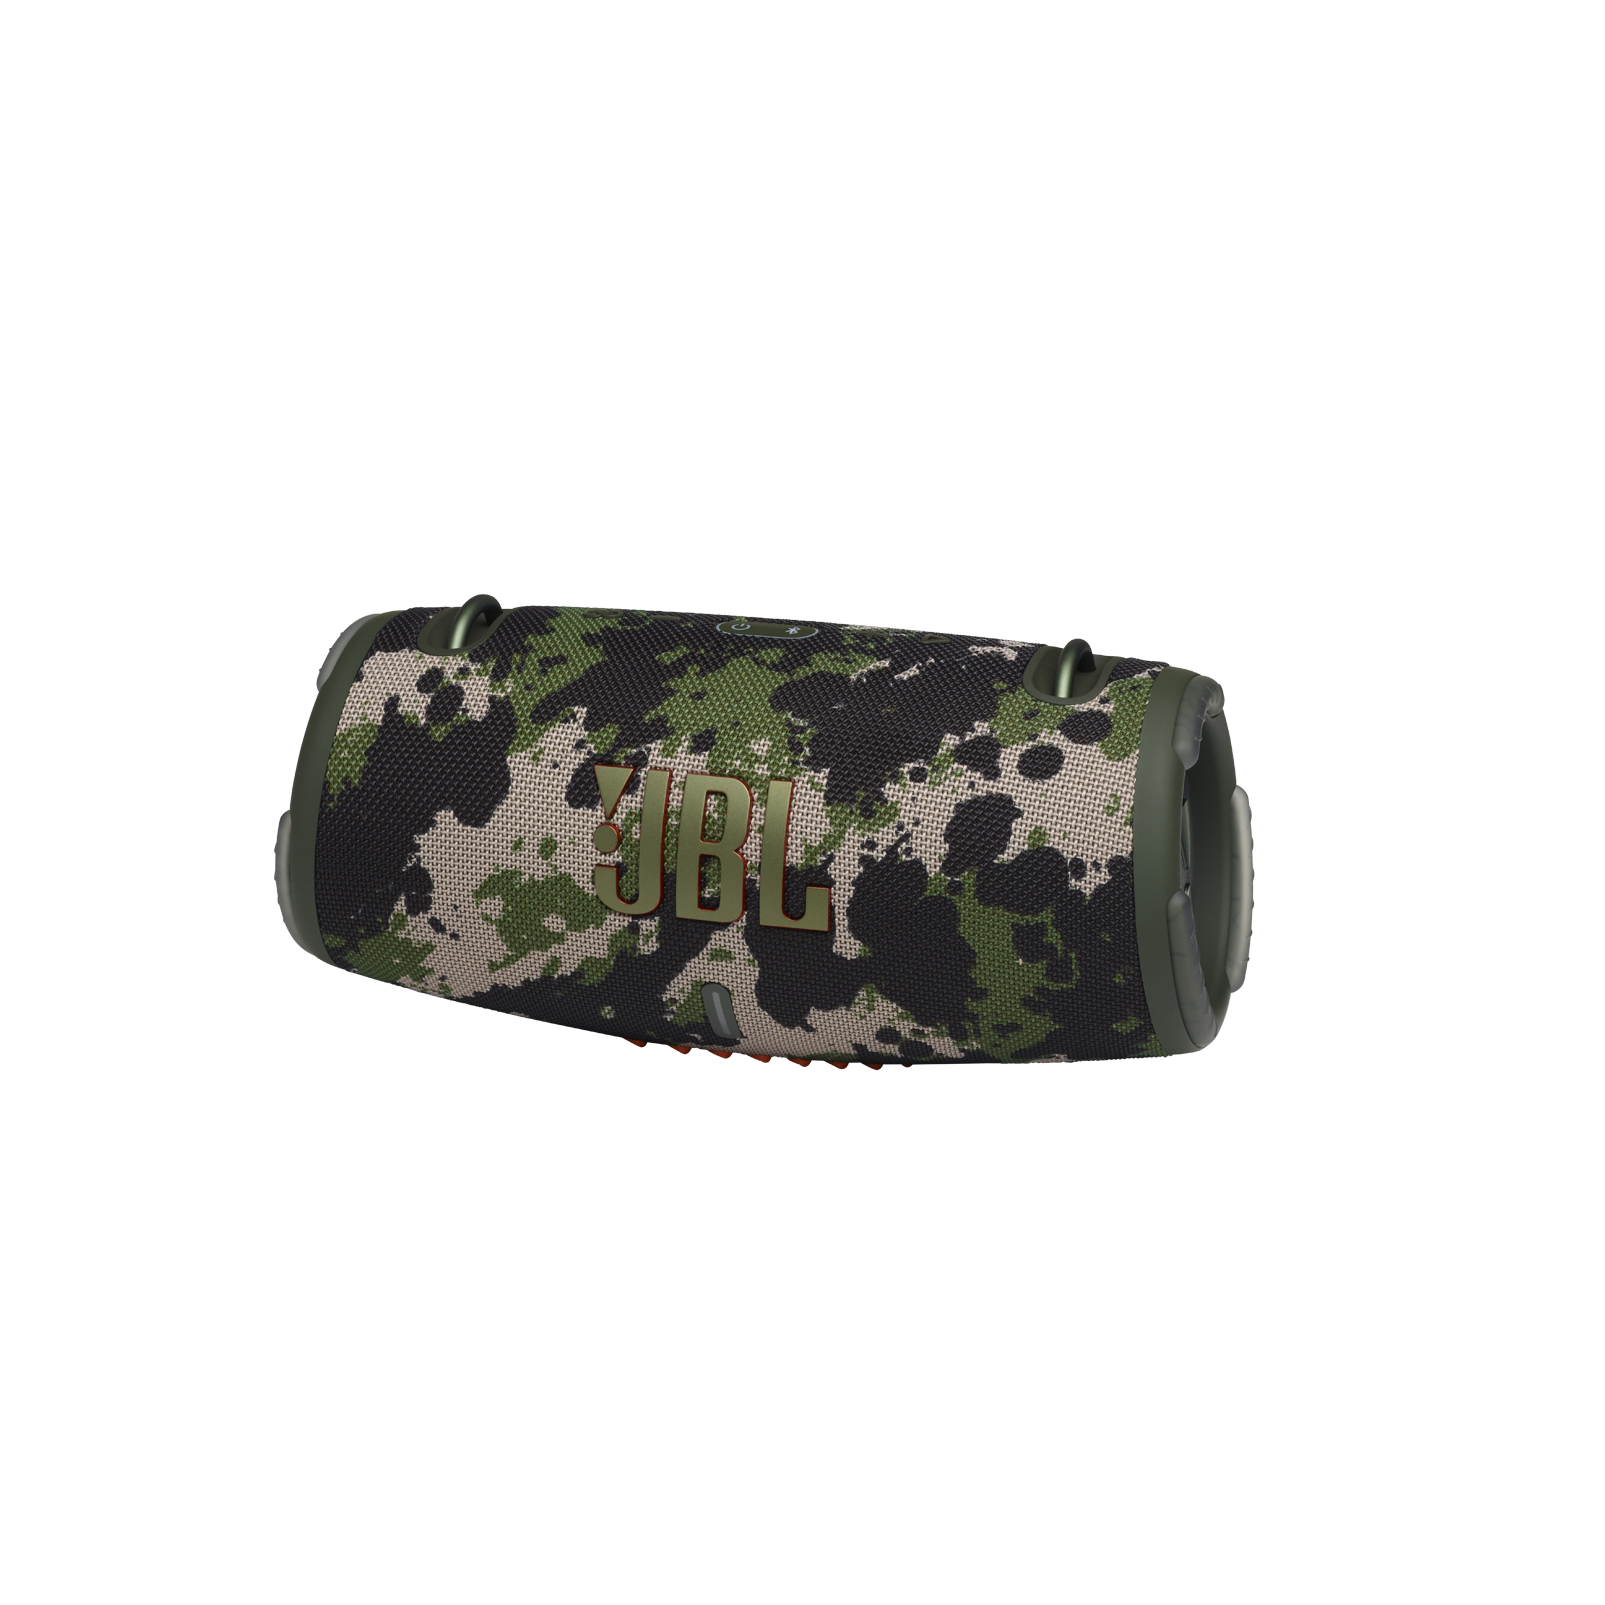 JBL Xtreme 3 - Black Camo - Portable waterproof speaker - Detailshot 4